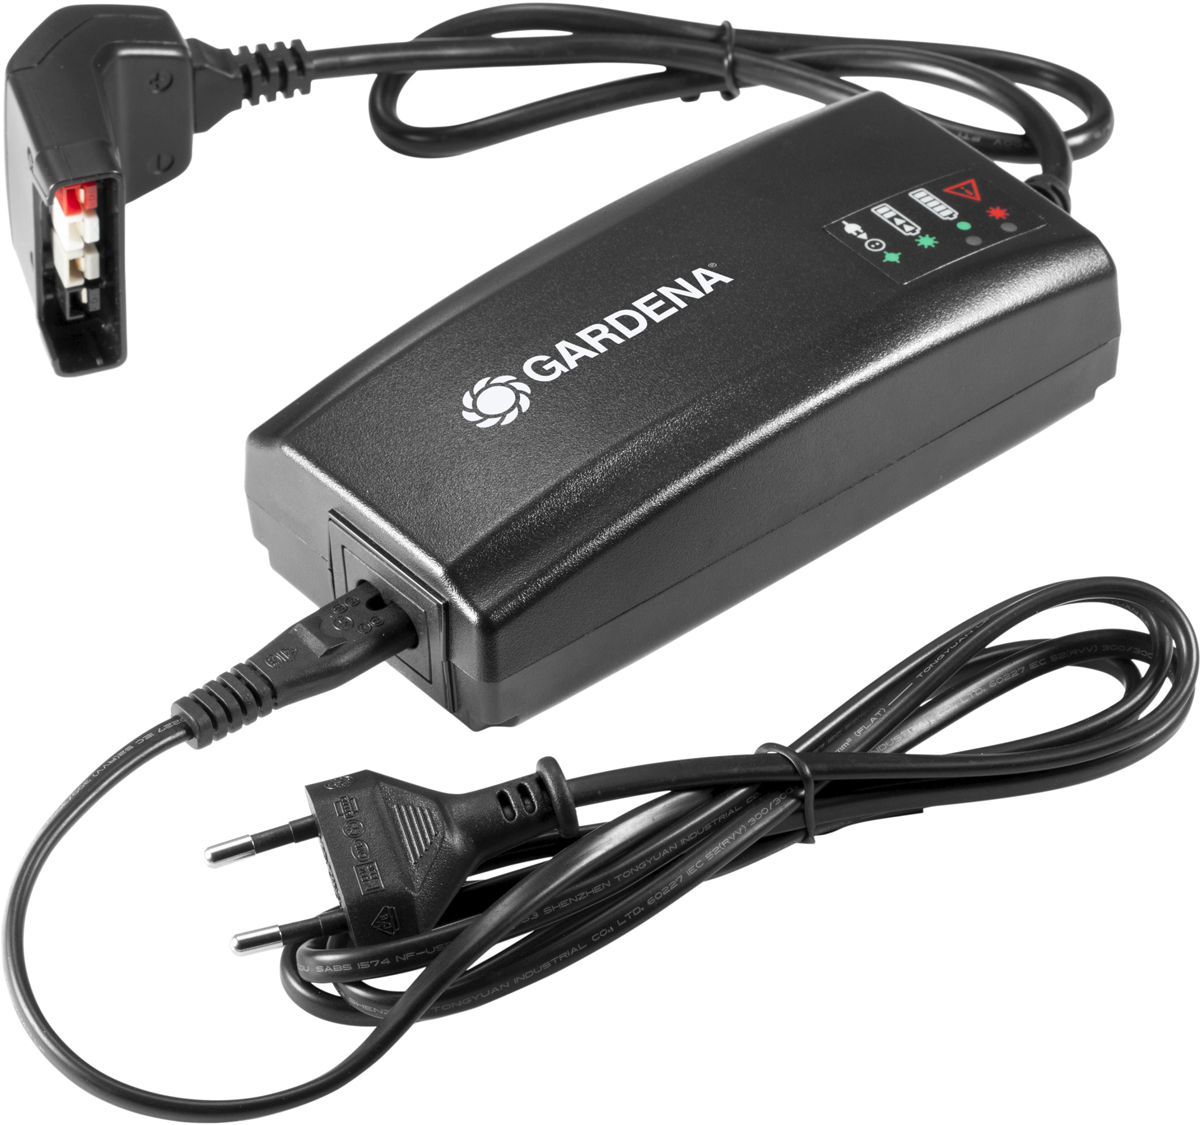 Зарядное устройство Gardena BLi-40, для литий-ионных аккумуляторов (для арт. 9842, 9843) аккумулятор gardena bli 40 160 литий ионный